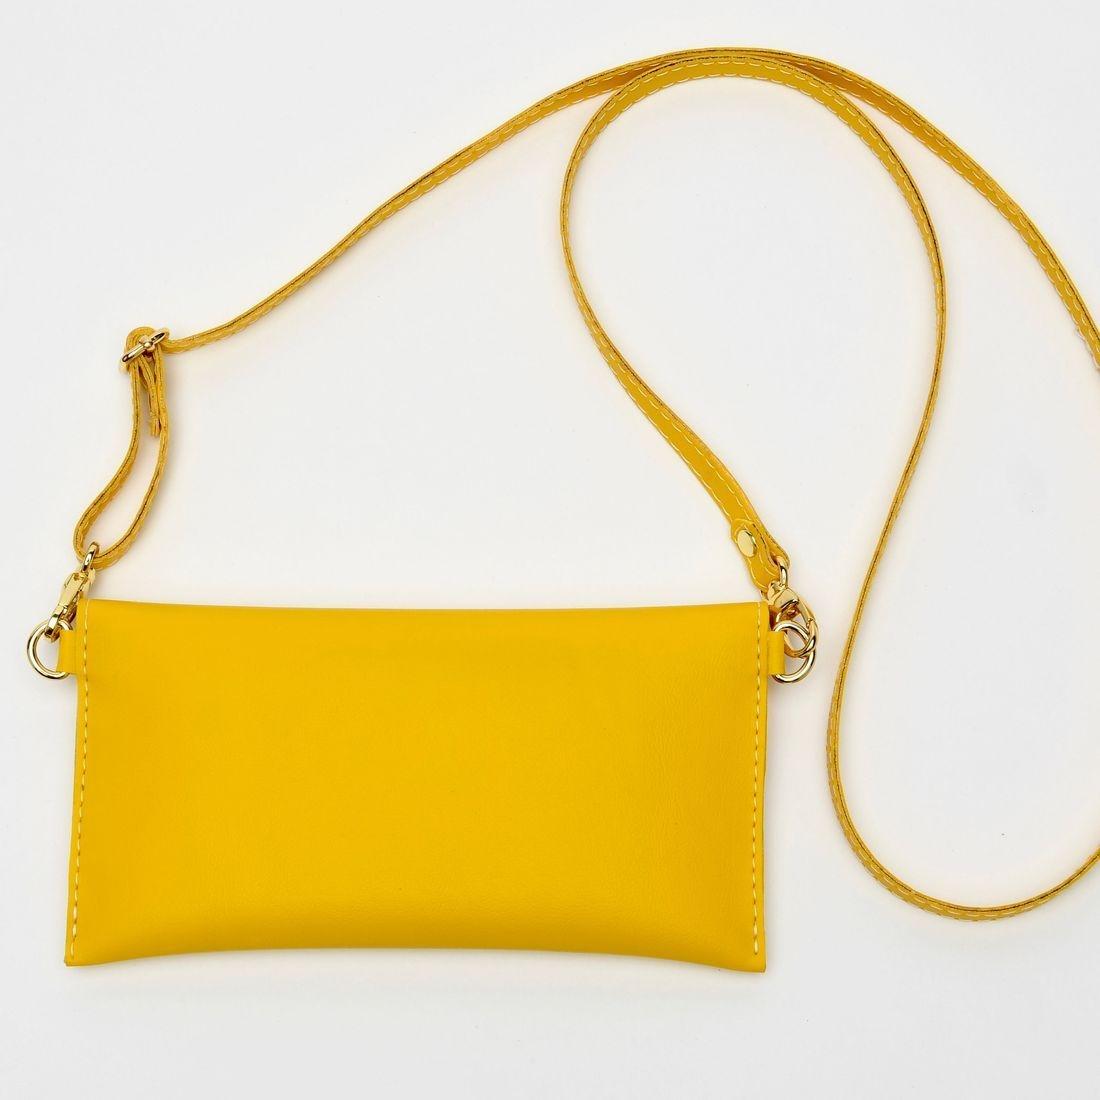 yellow crossbody bag, leather handbag, iPhone 7 case, small yellow purse